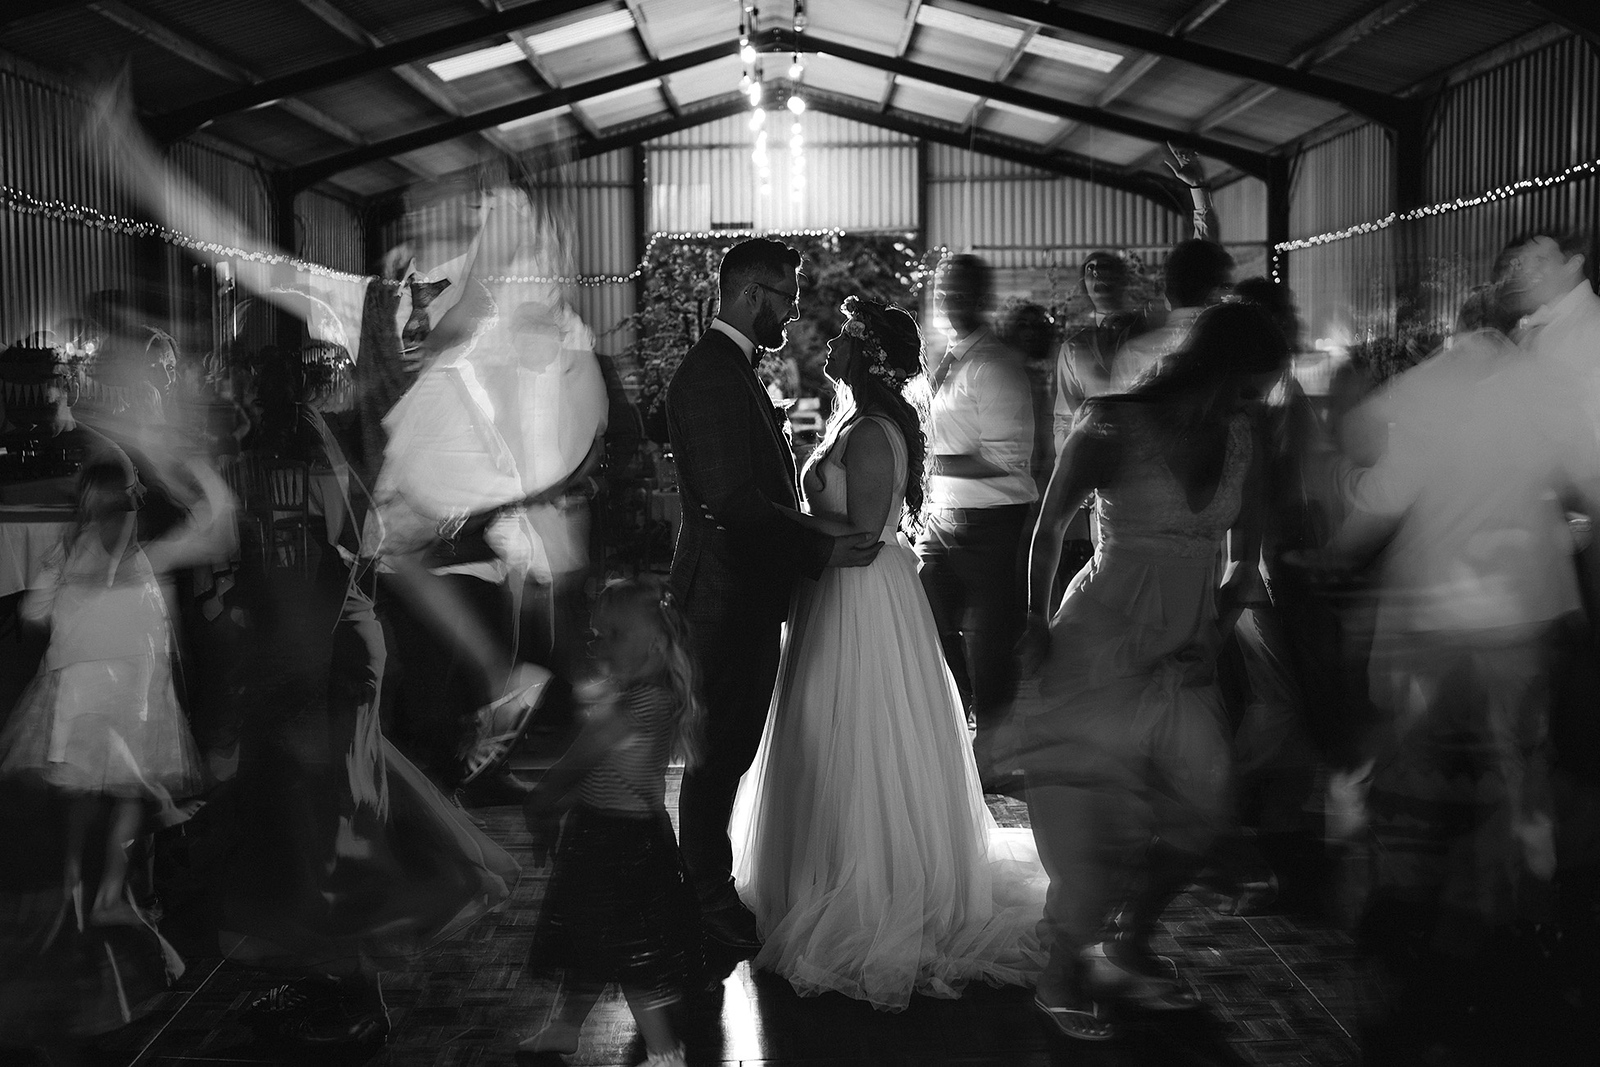 Creative wedding photo of bride and groom